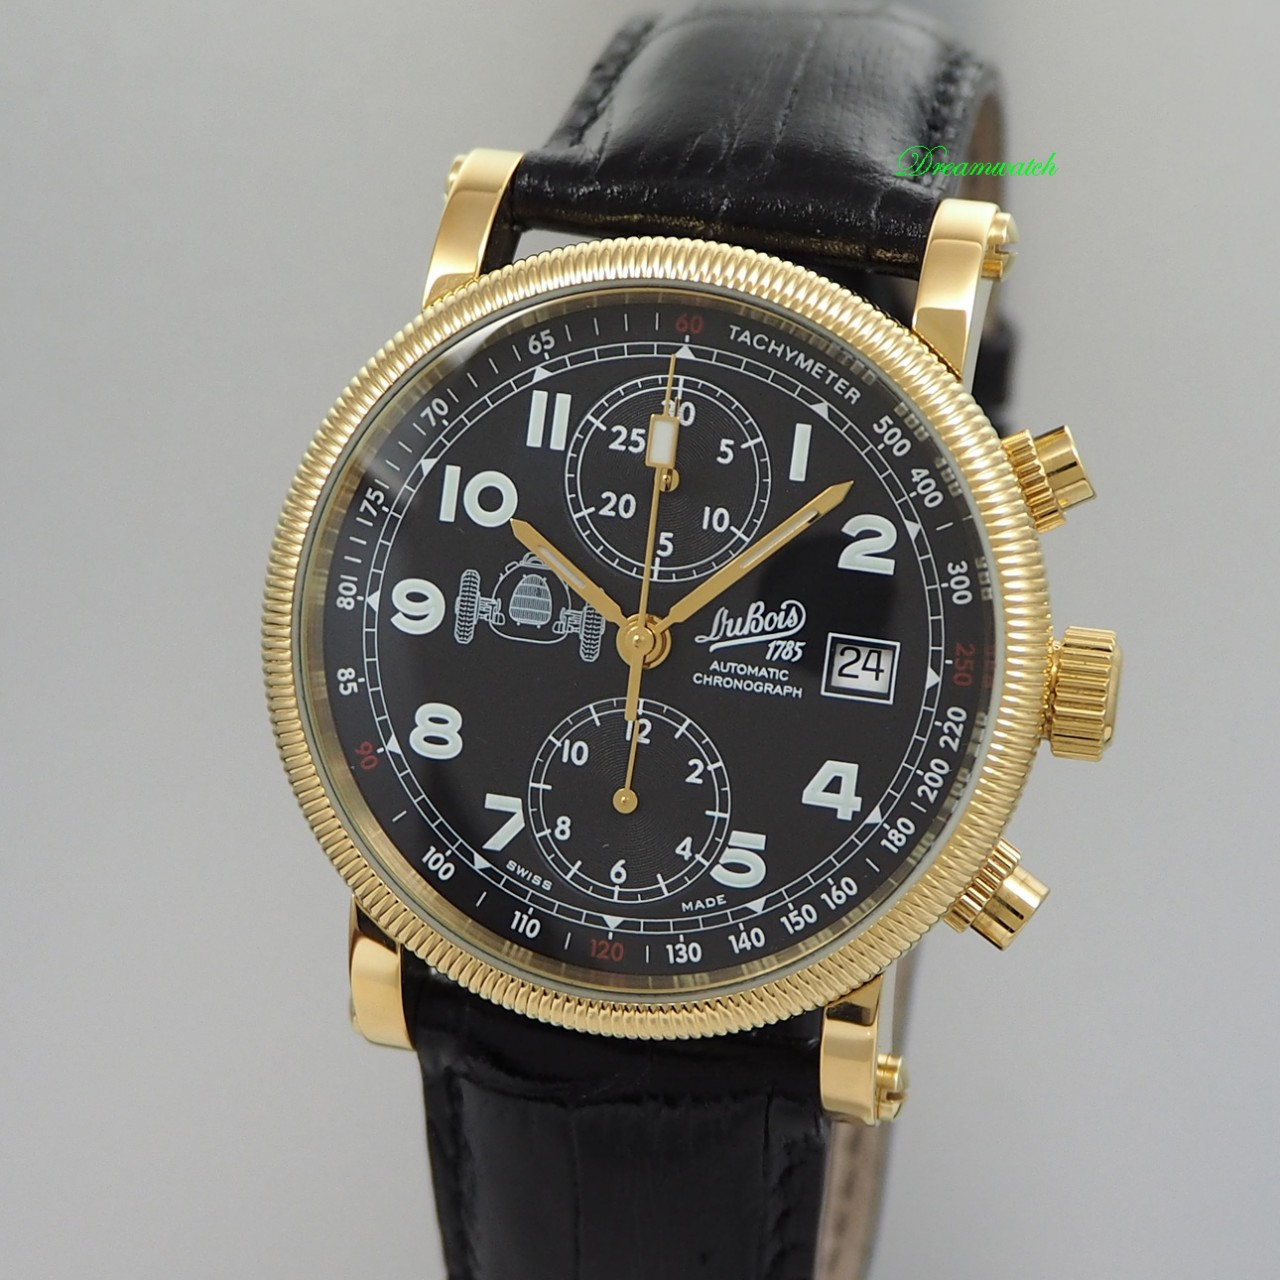 Dubois & Fils Racing Chronograph NOS, Box+Papiere